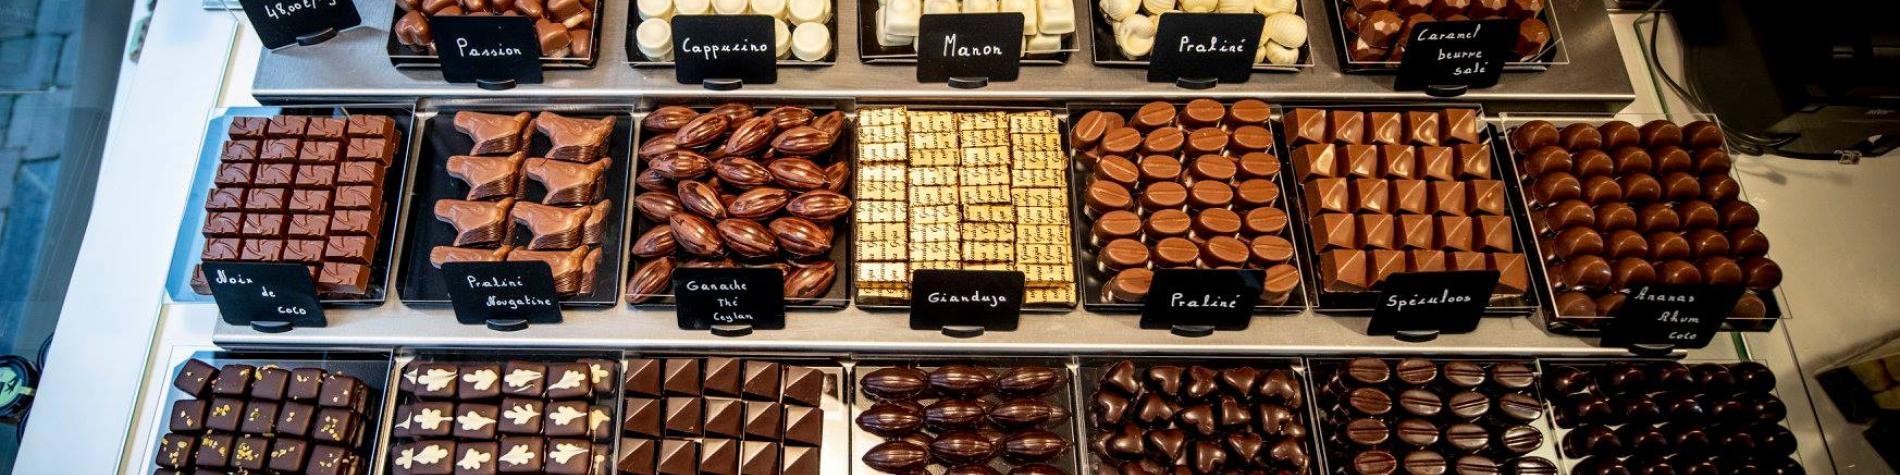 Pralines de l'Atelier O Chocolat